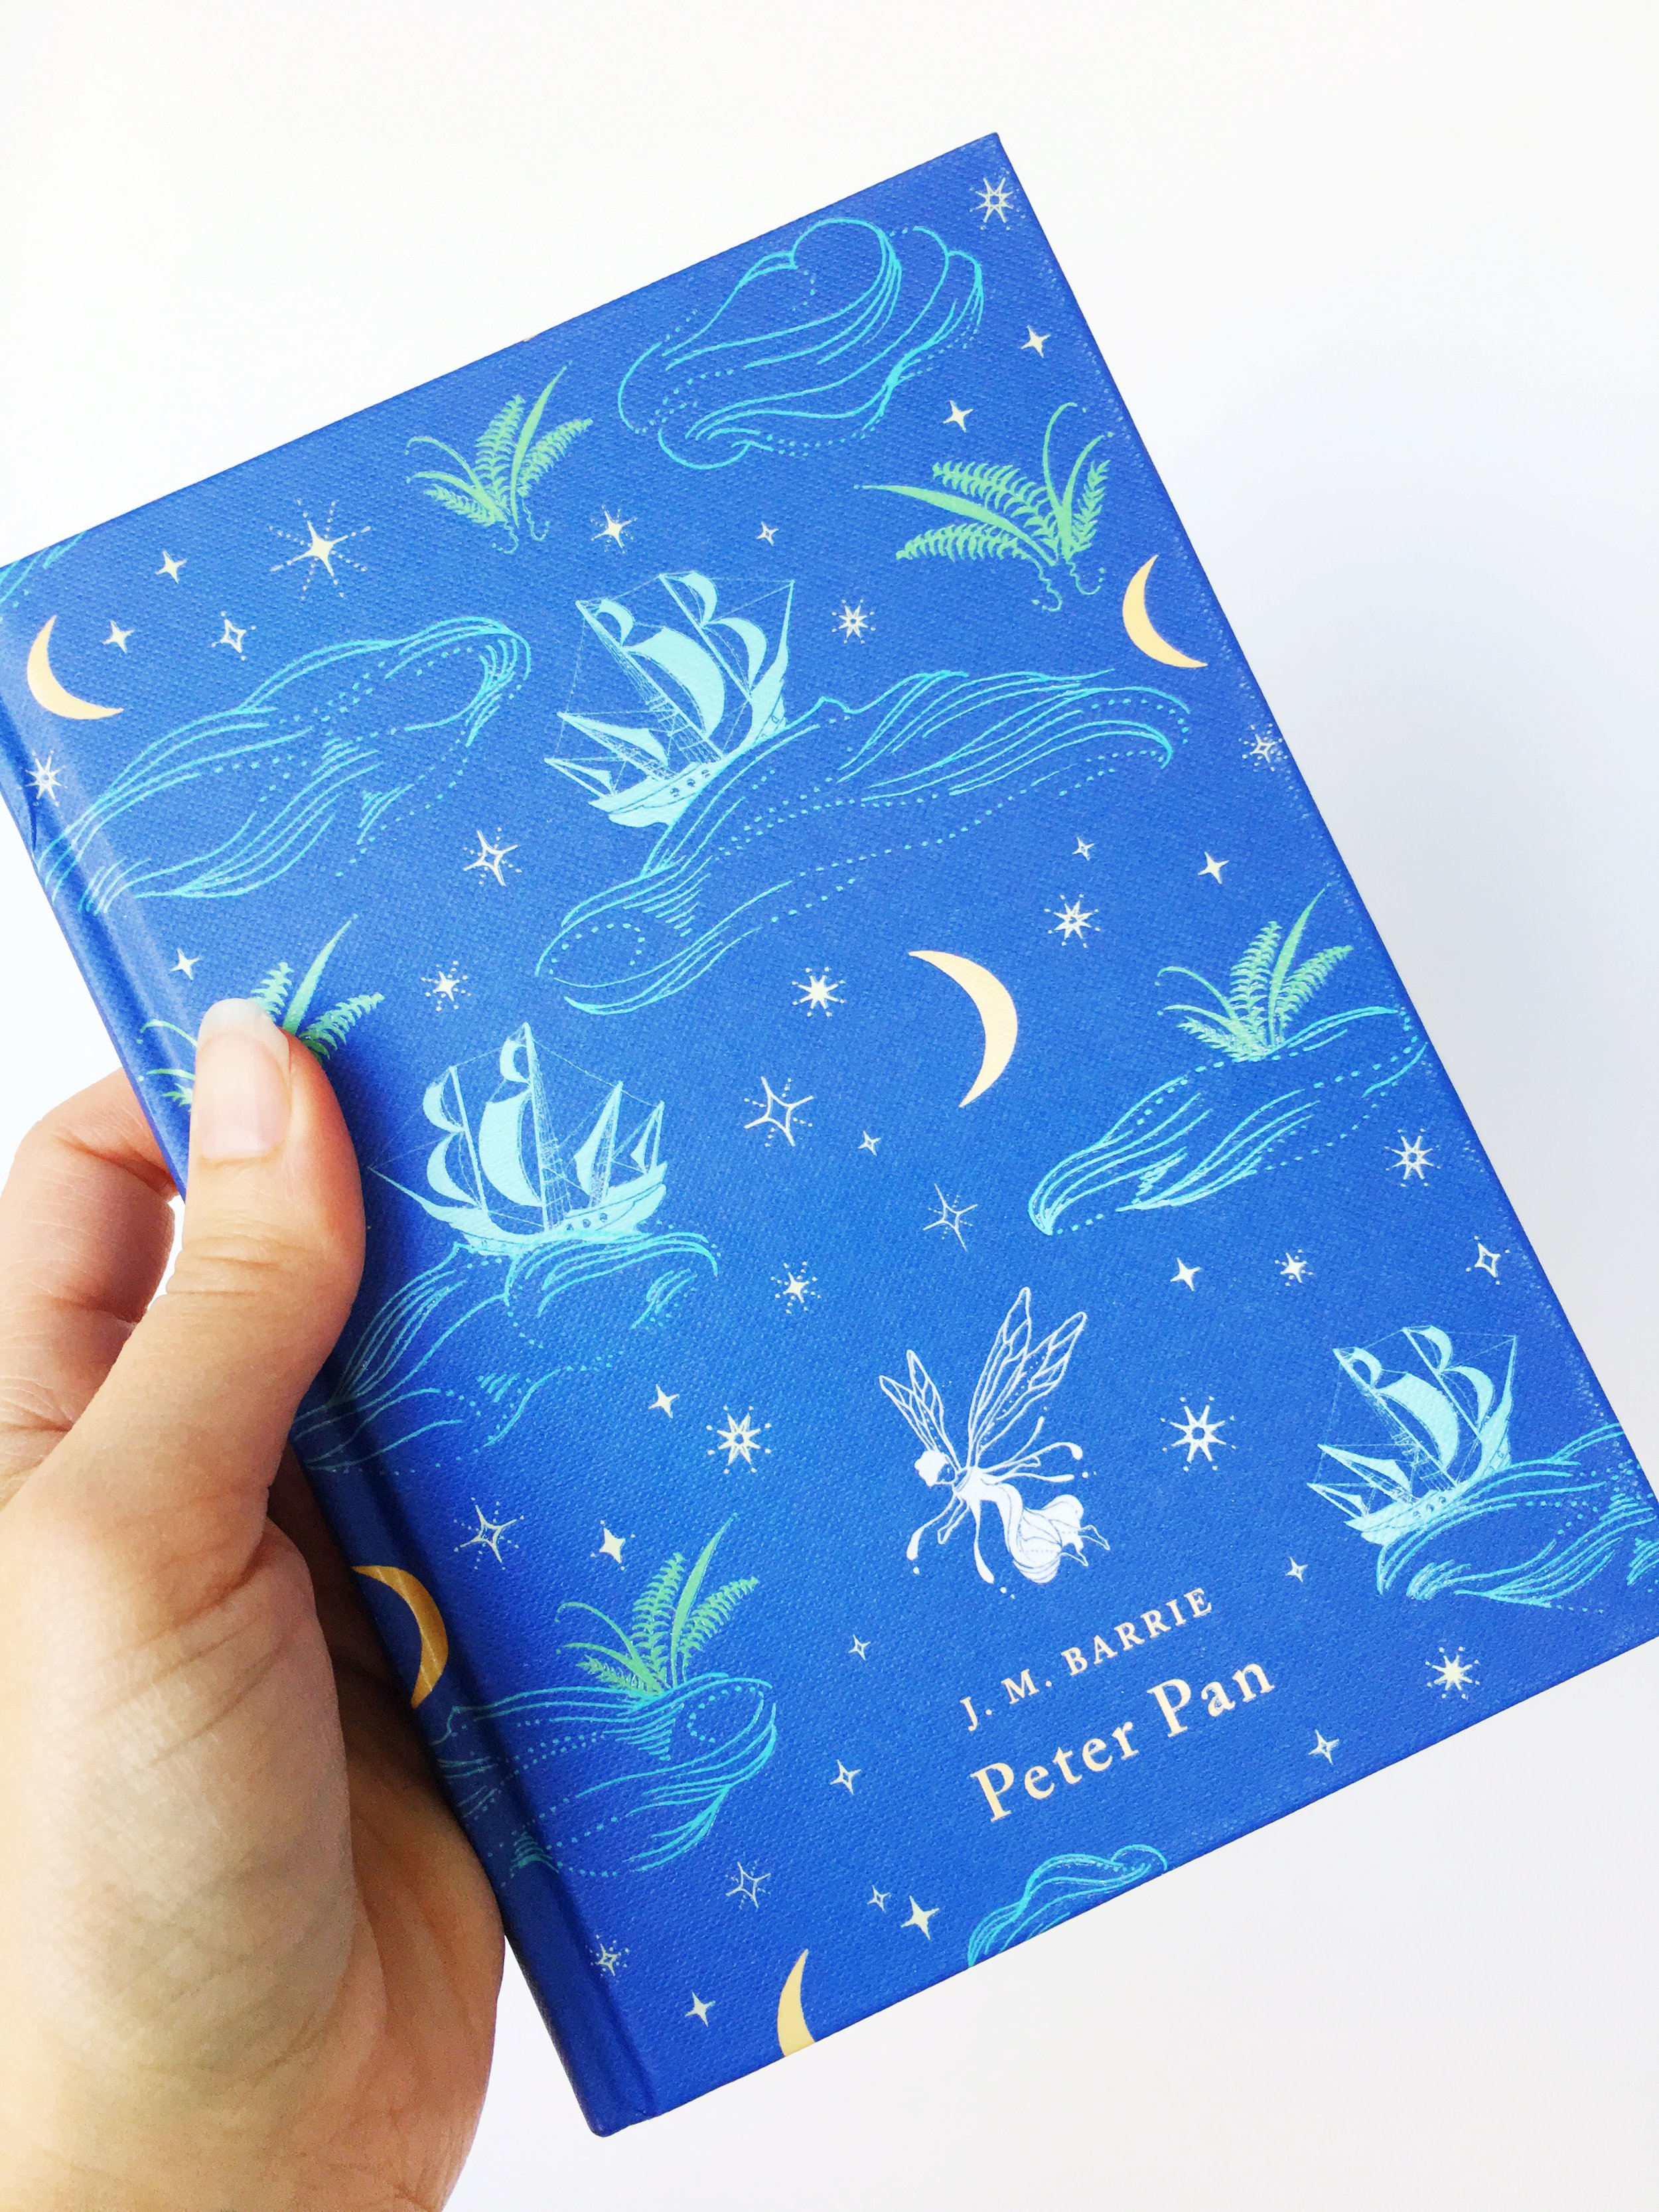 Pretty Puffin Book Peter Pan